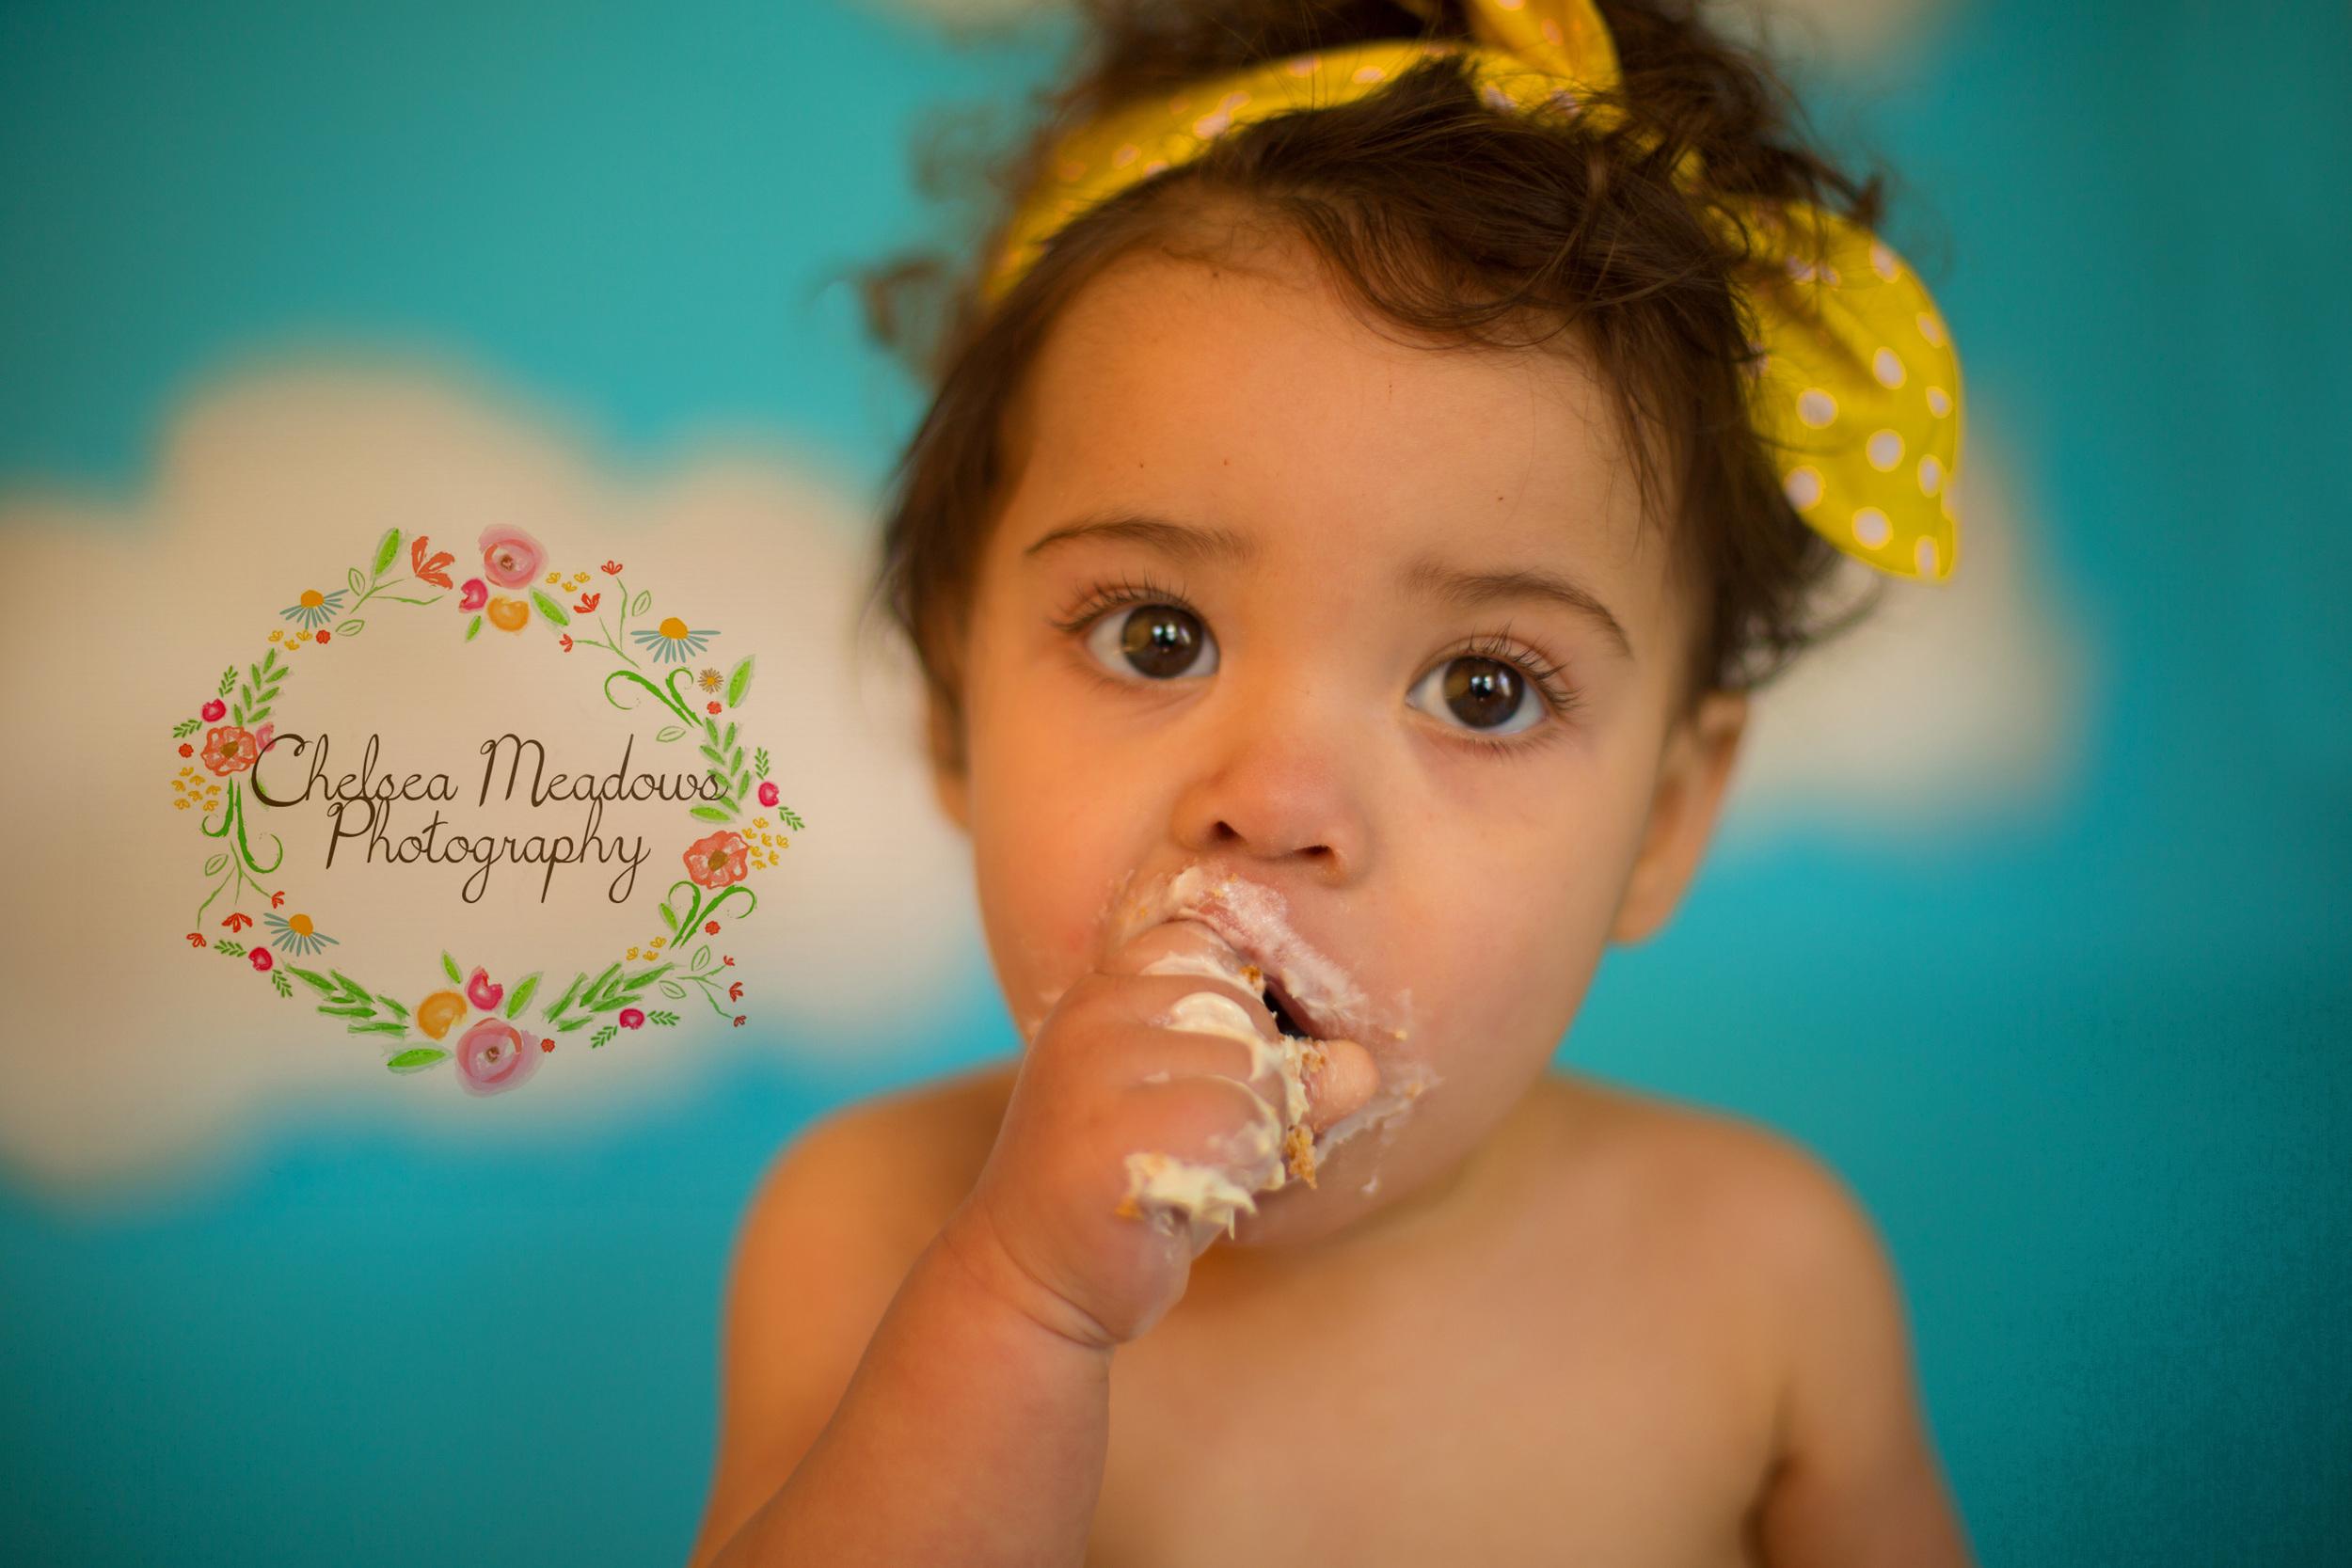 Nardi Family Photos - Chelsea Meadows Photography (31).jpg